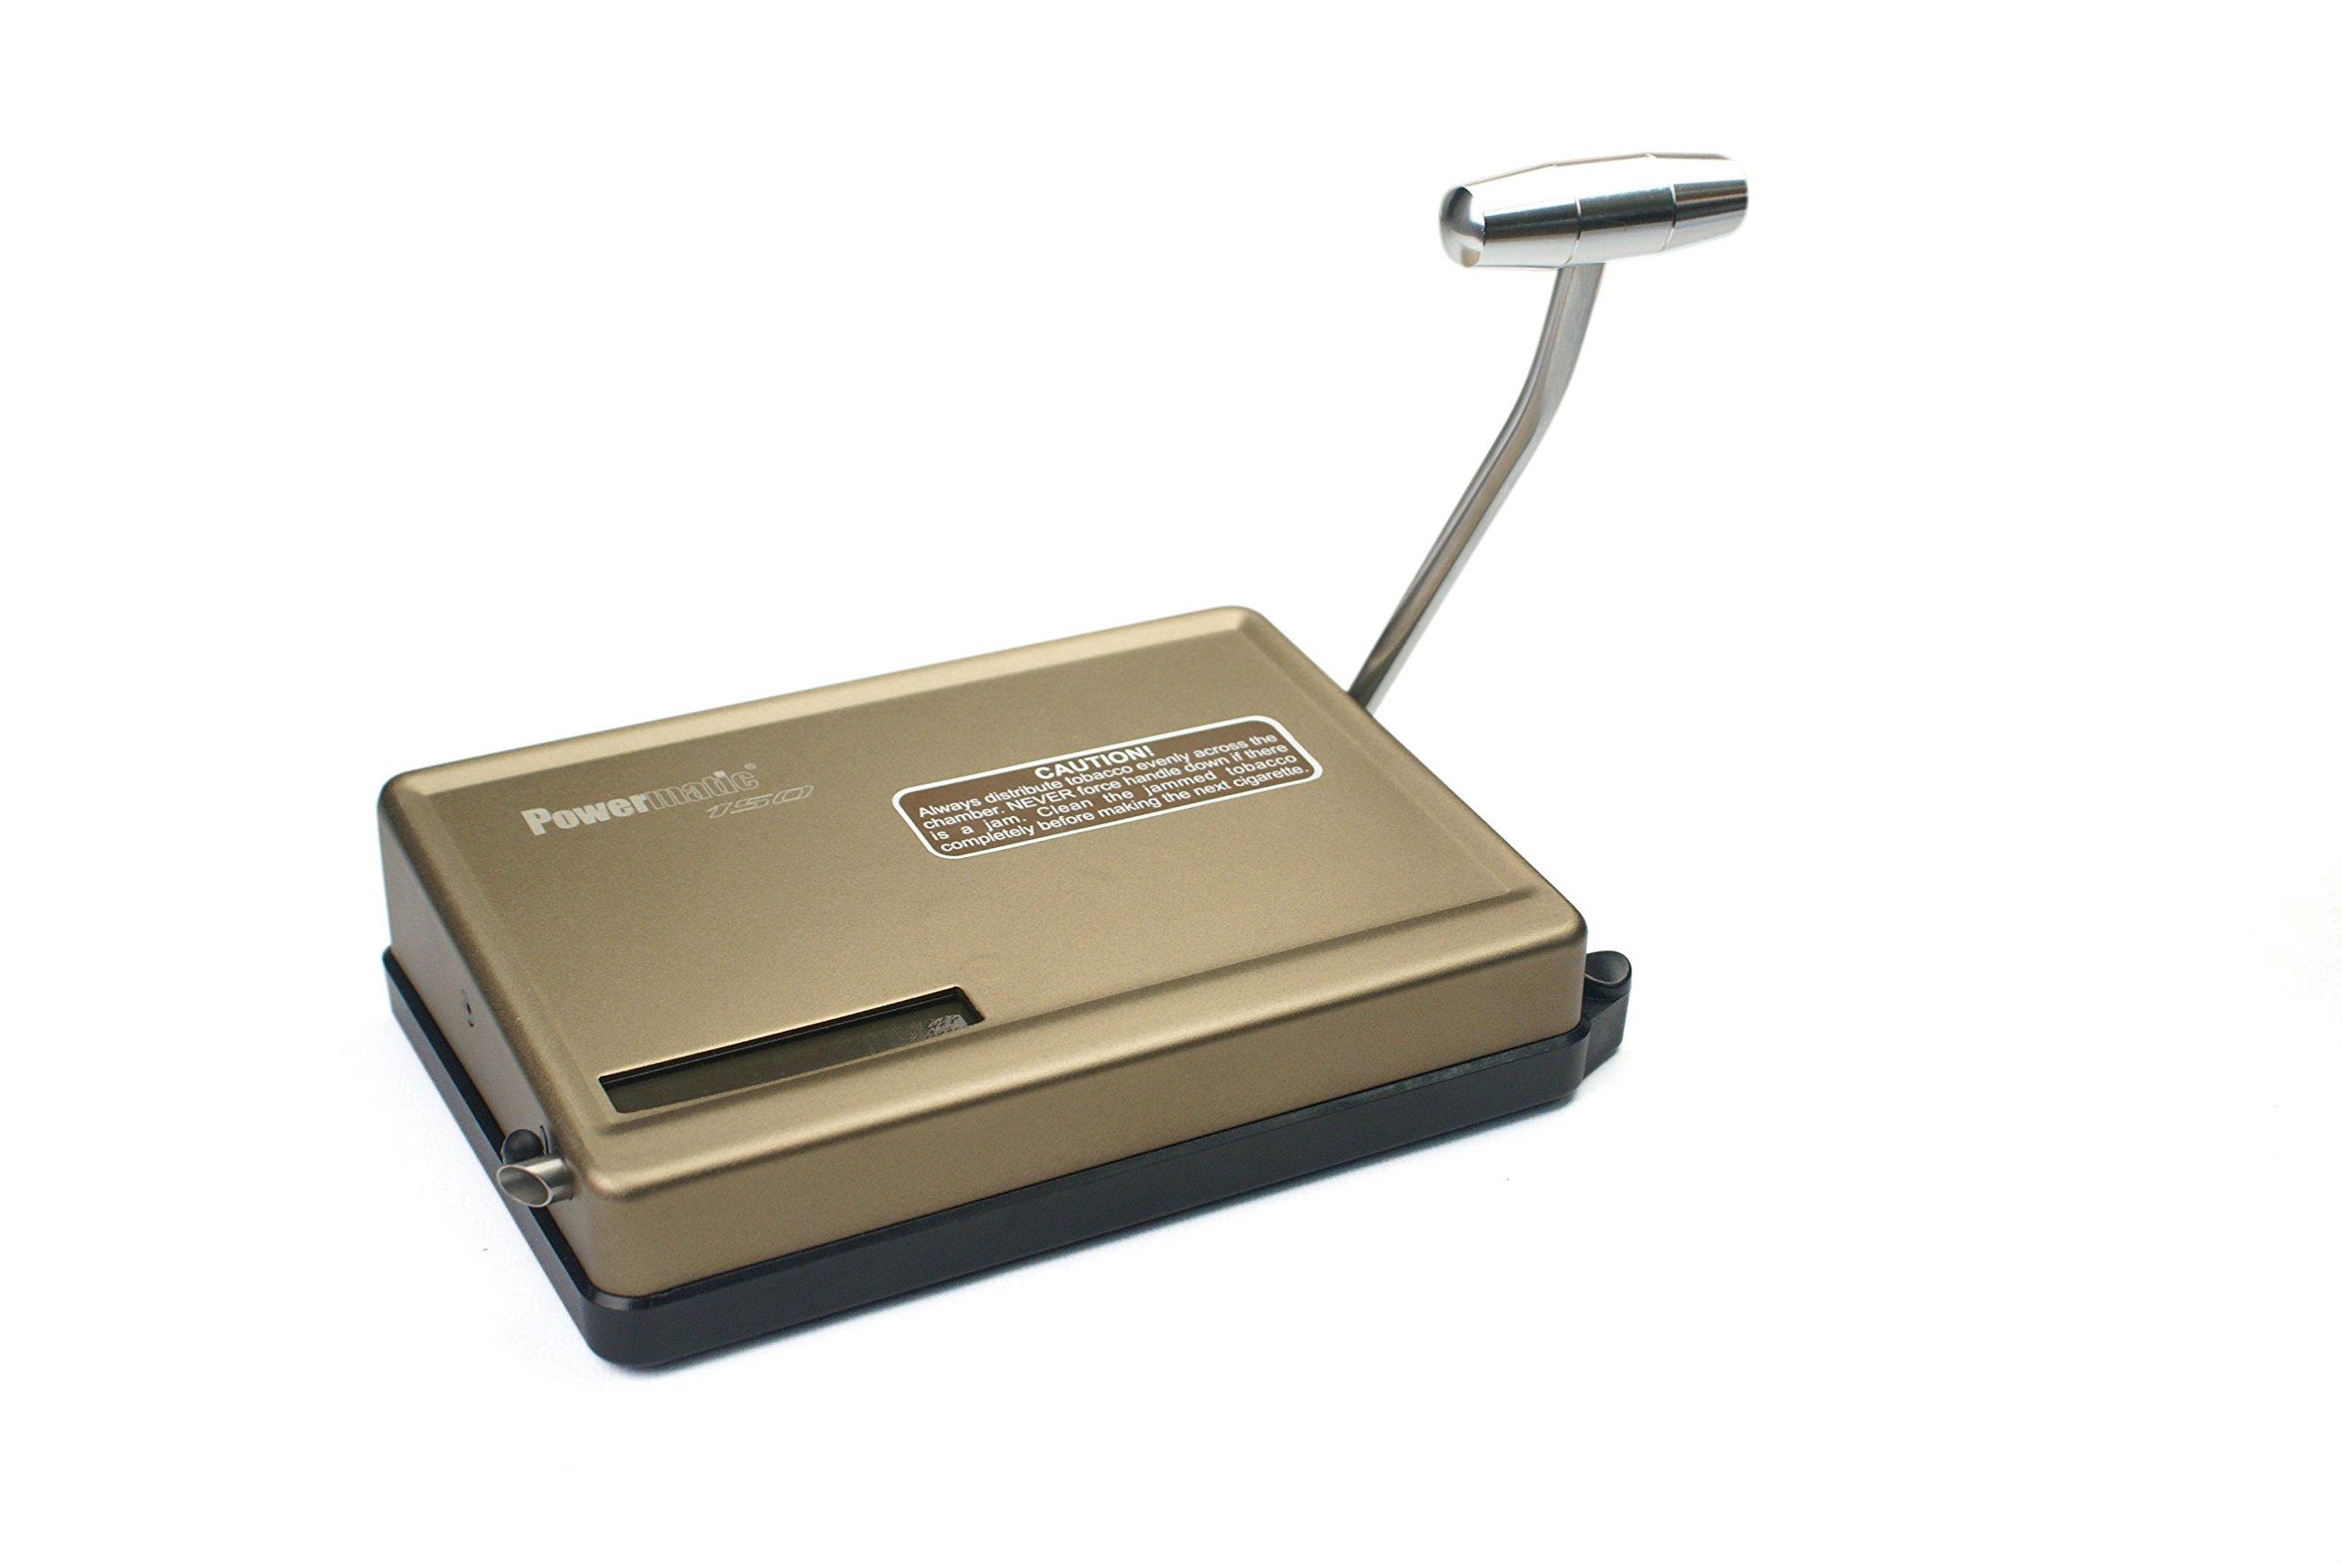 Powermatic 150 Bronze by Powermatic